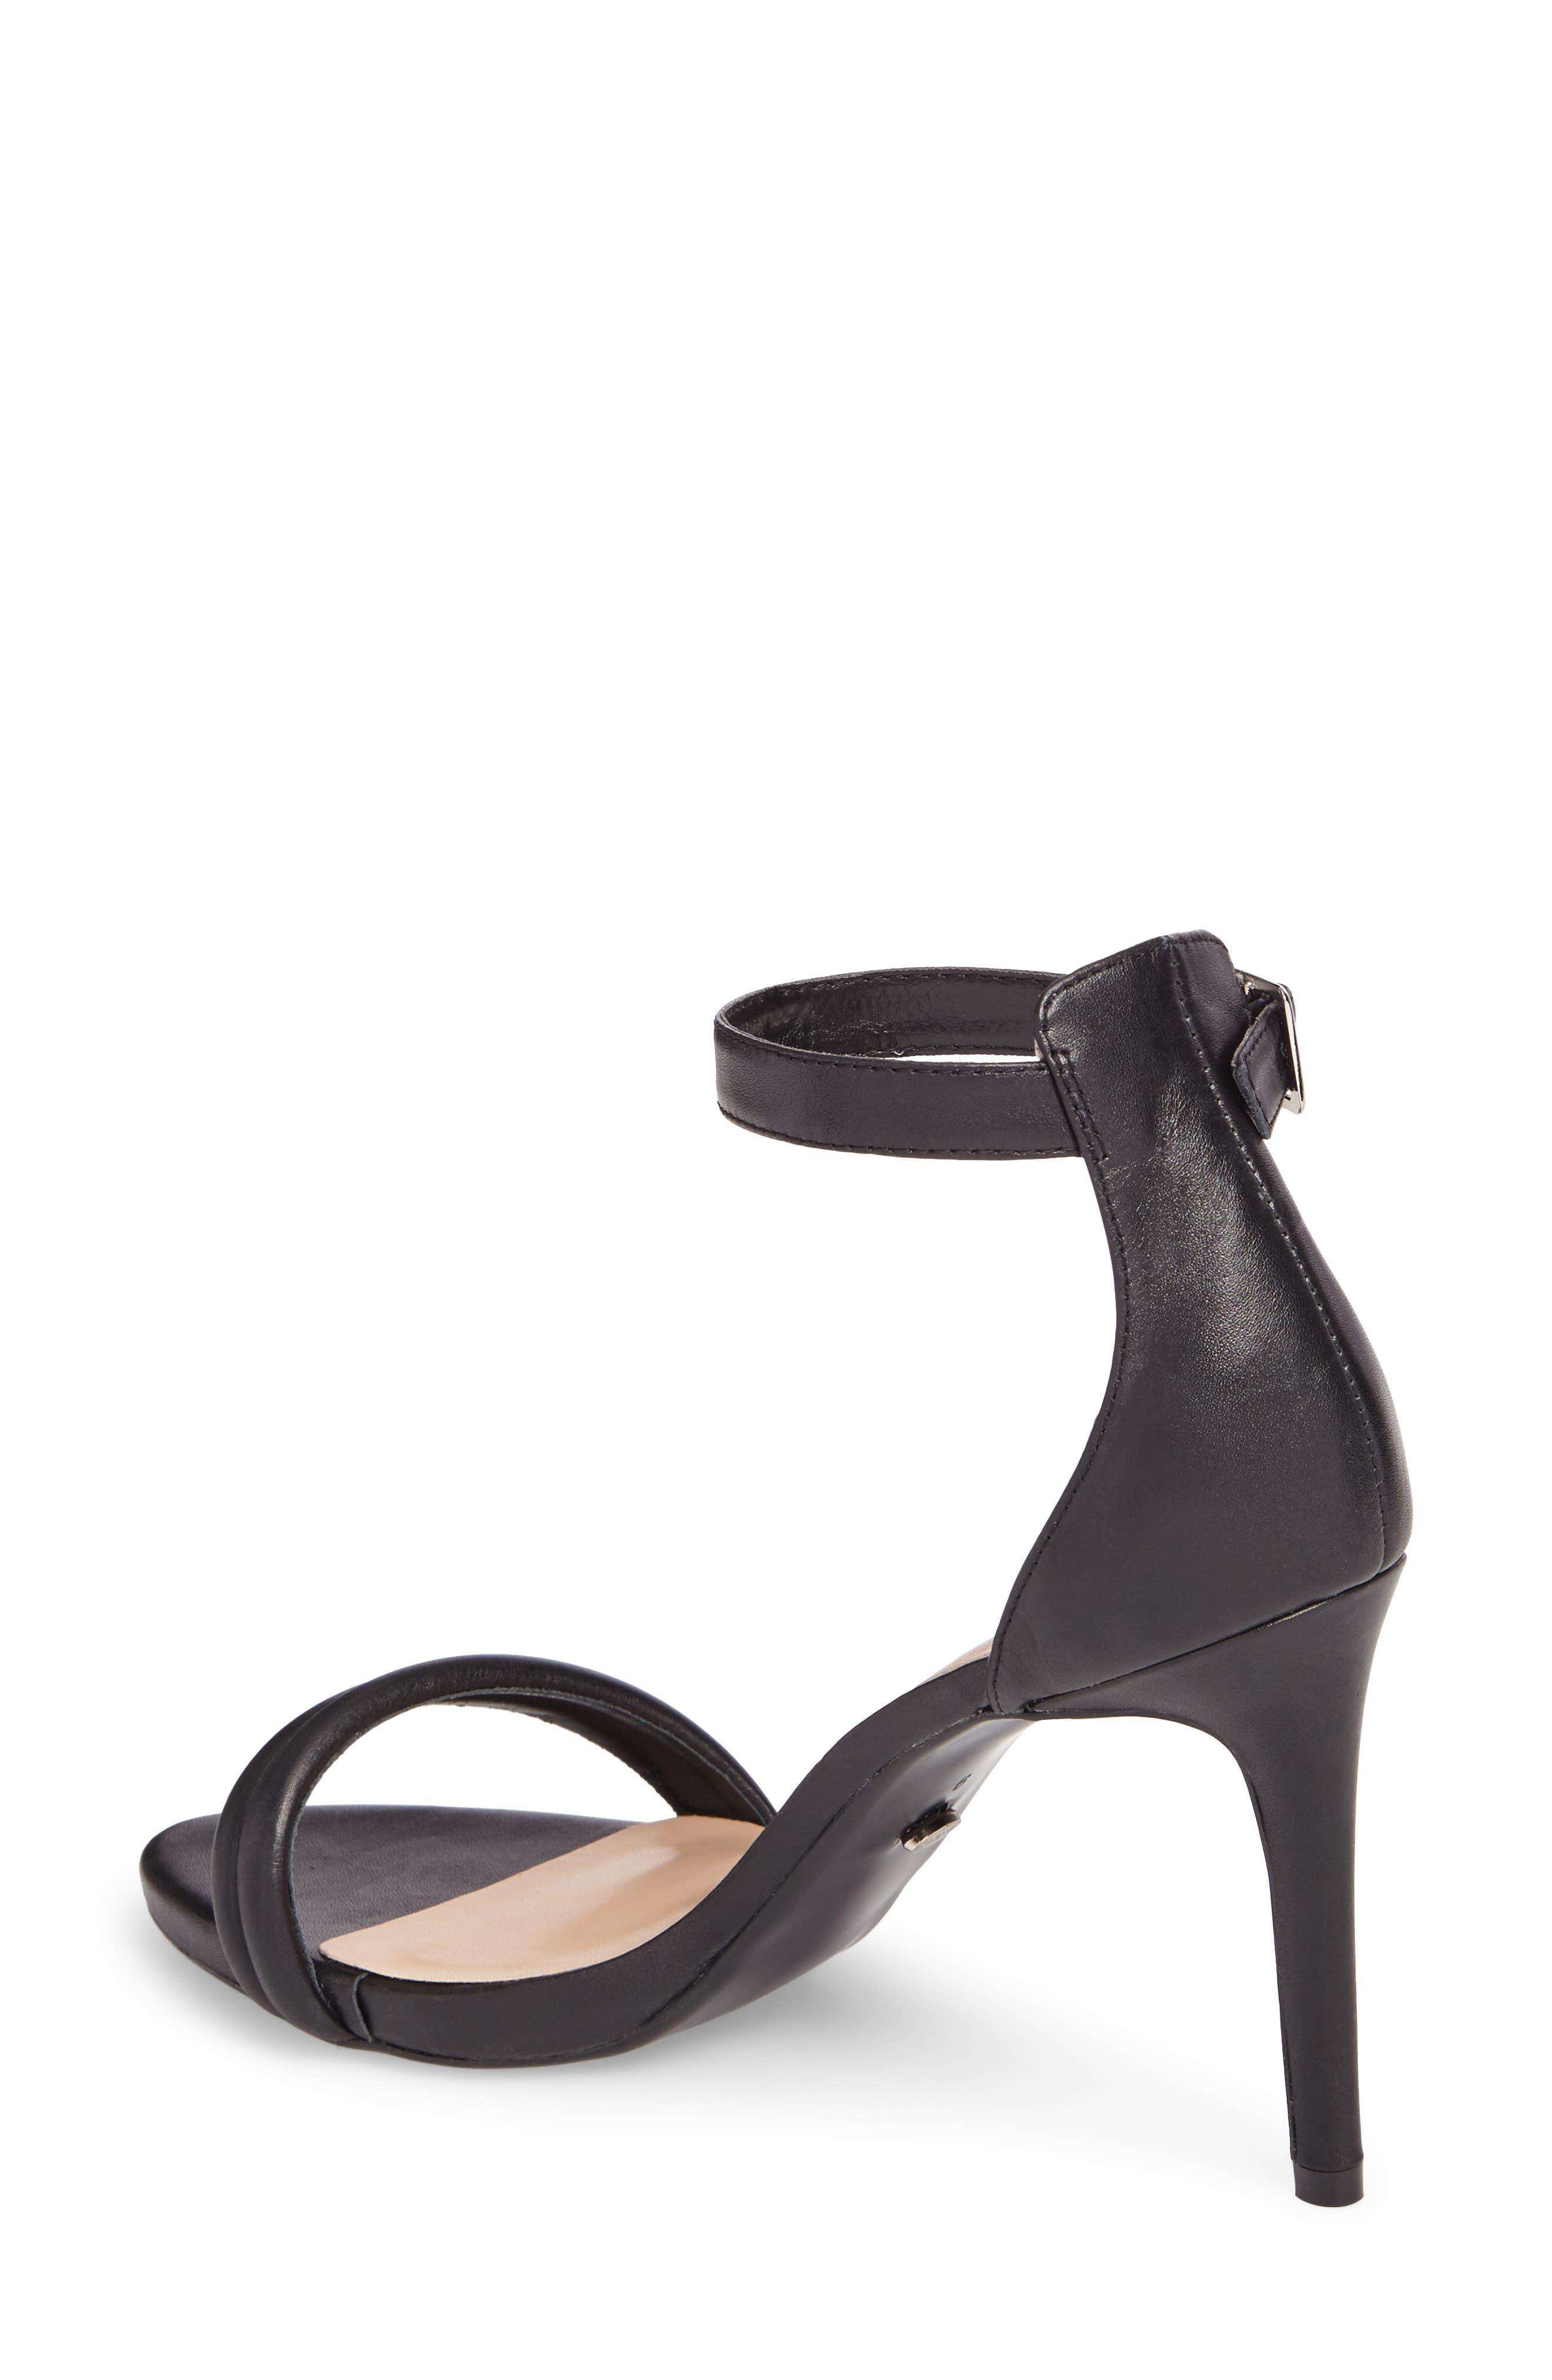 Camila Strappy Sandal,                             Alternate thumbnail 2, color,                             Black Capretto Leather